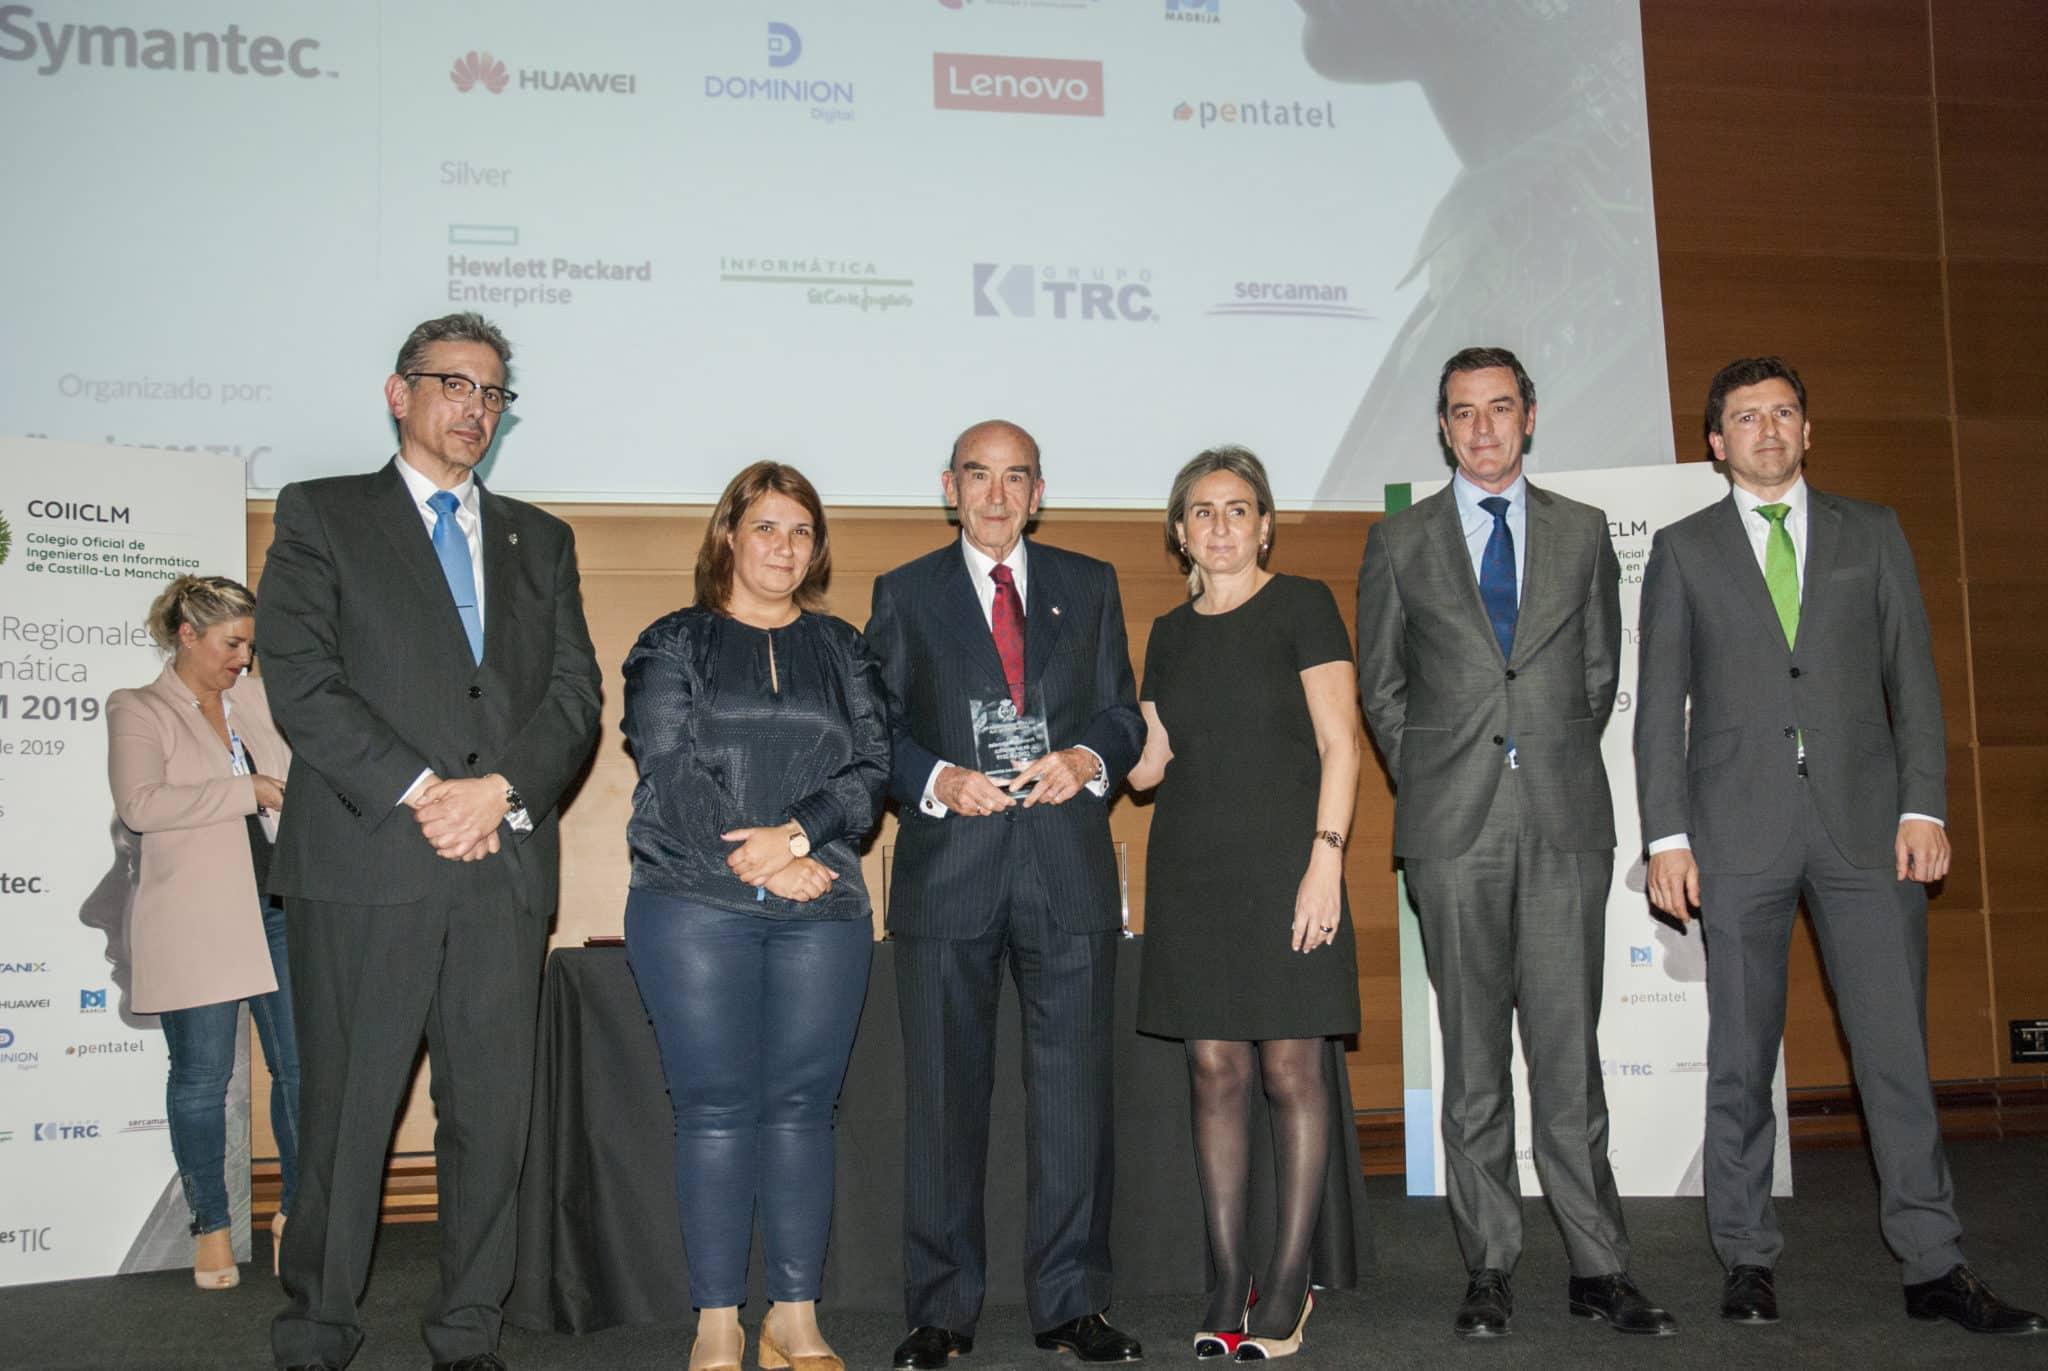 https://blog.globalcaja.es/wp-content/uploads/2019/02/Premio-COIICLM.jpg